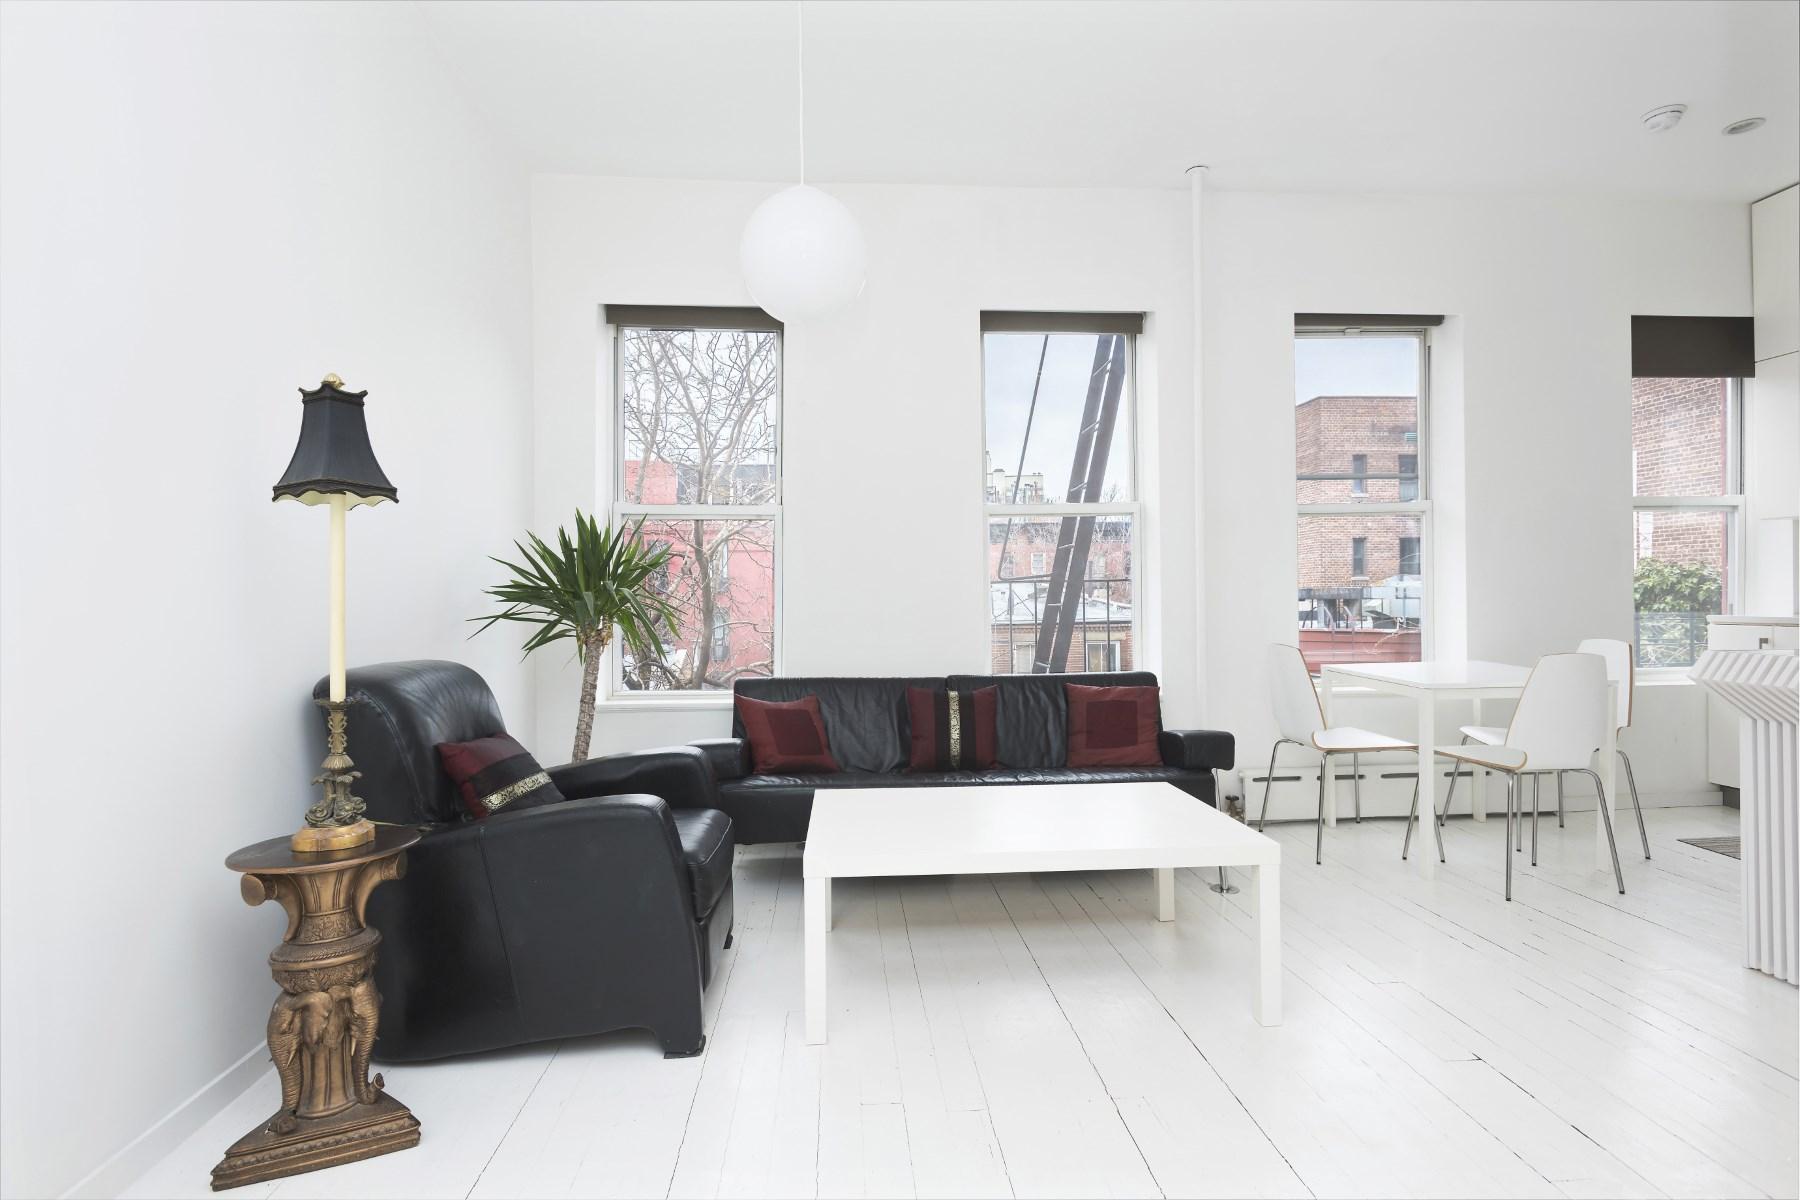 Кооперативная квартира для того Продажа на 327 West 11th Street 327 West 11th Street Apt 3r New York, Нью-Йорк 10014 Соединенные Штаты